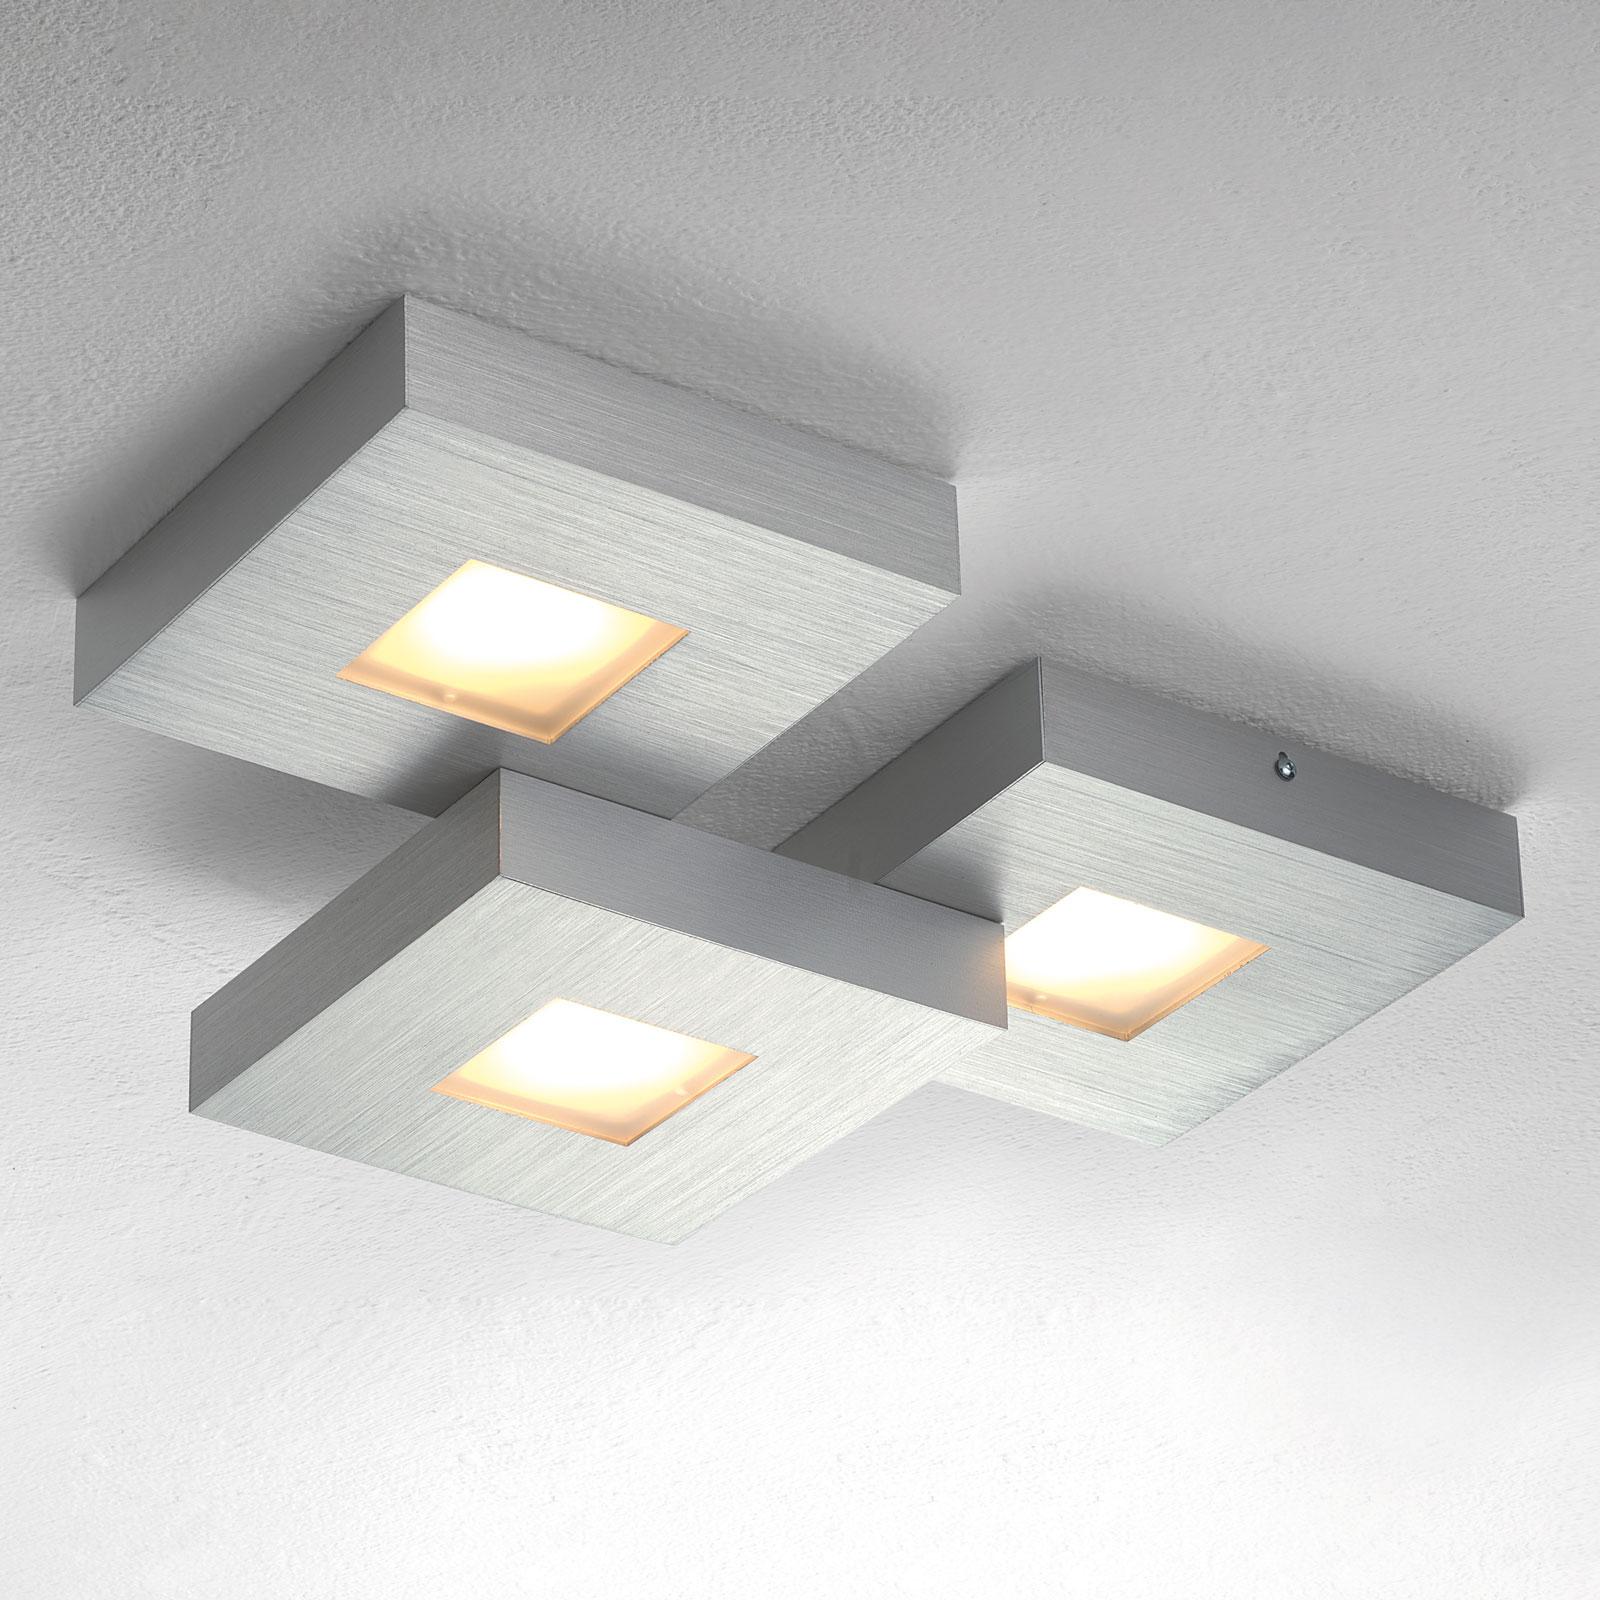 Cubus - three-bulb LED ceiling light_1556047_1